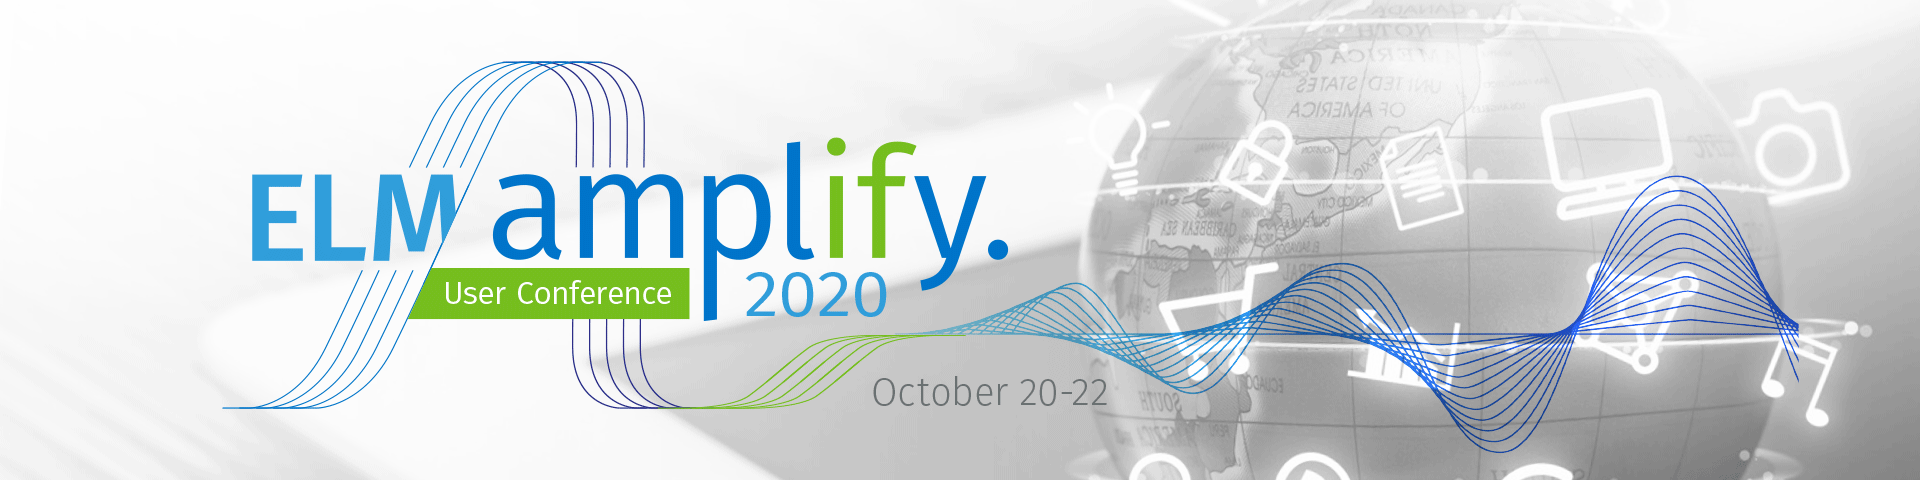 ELM Amplify user conference